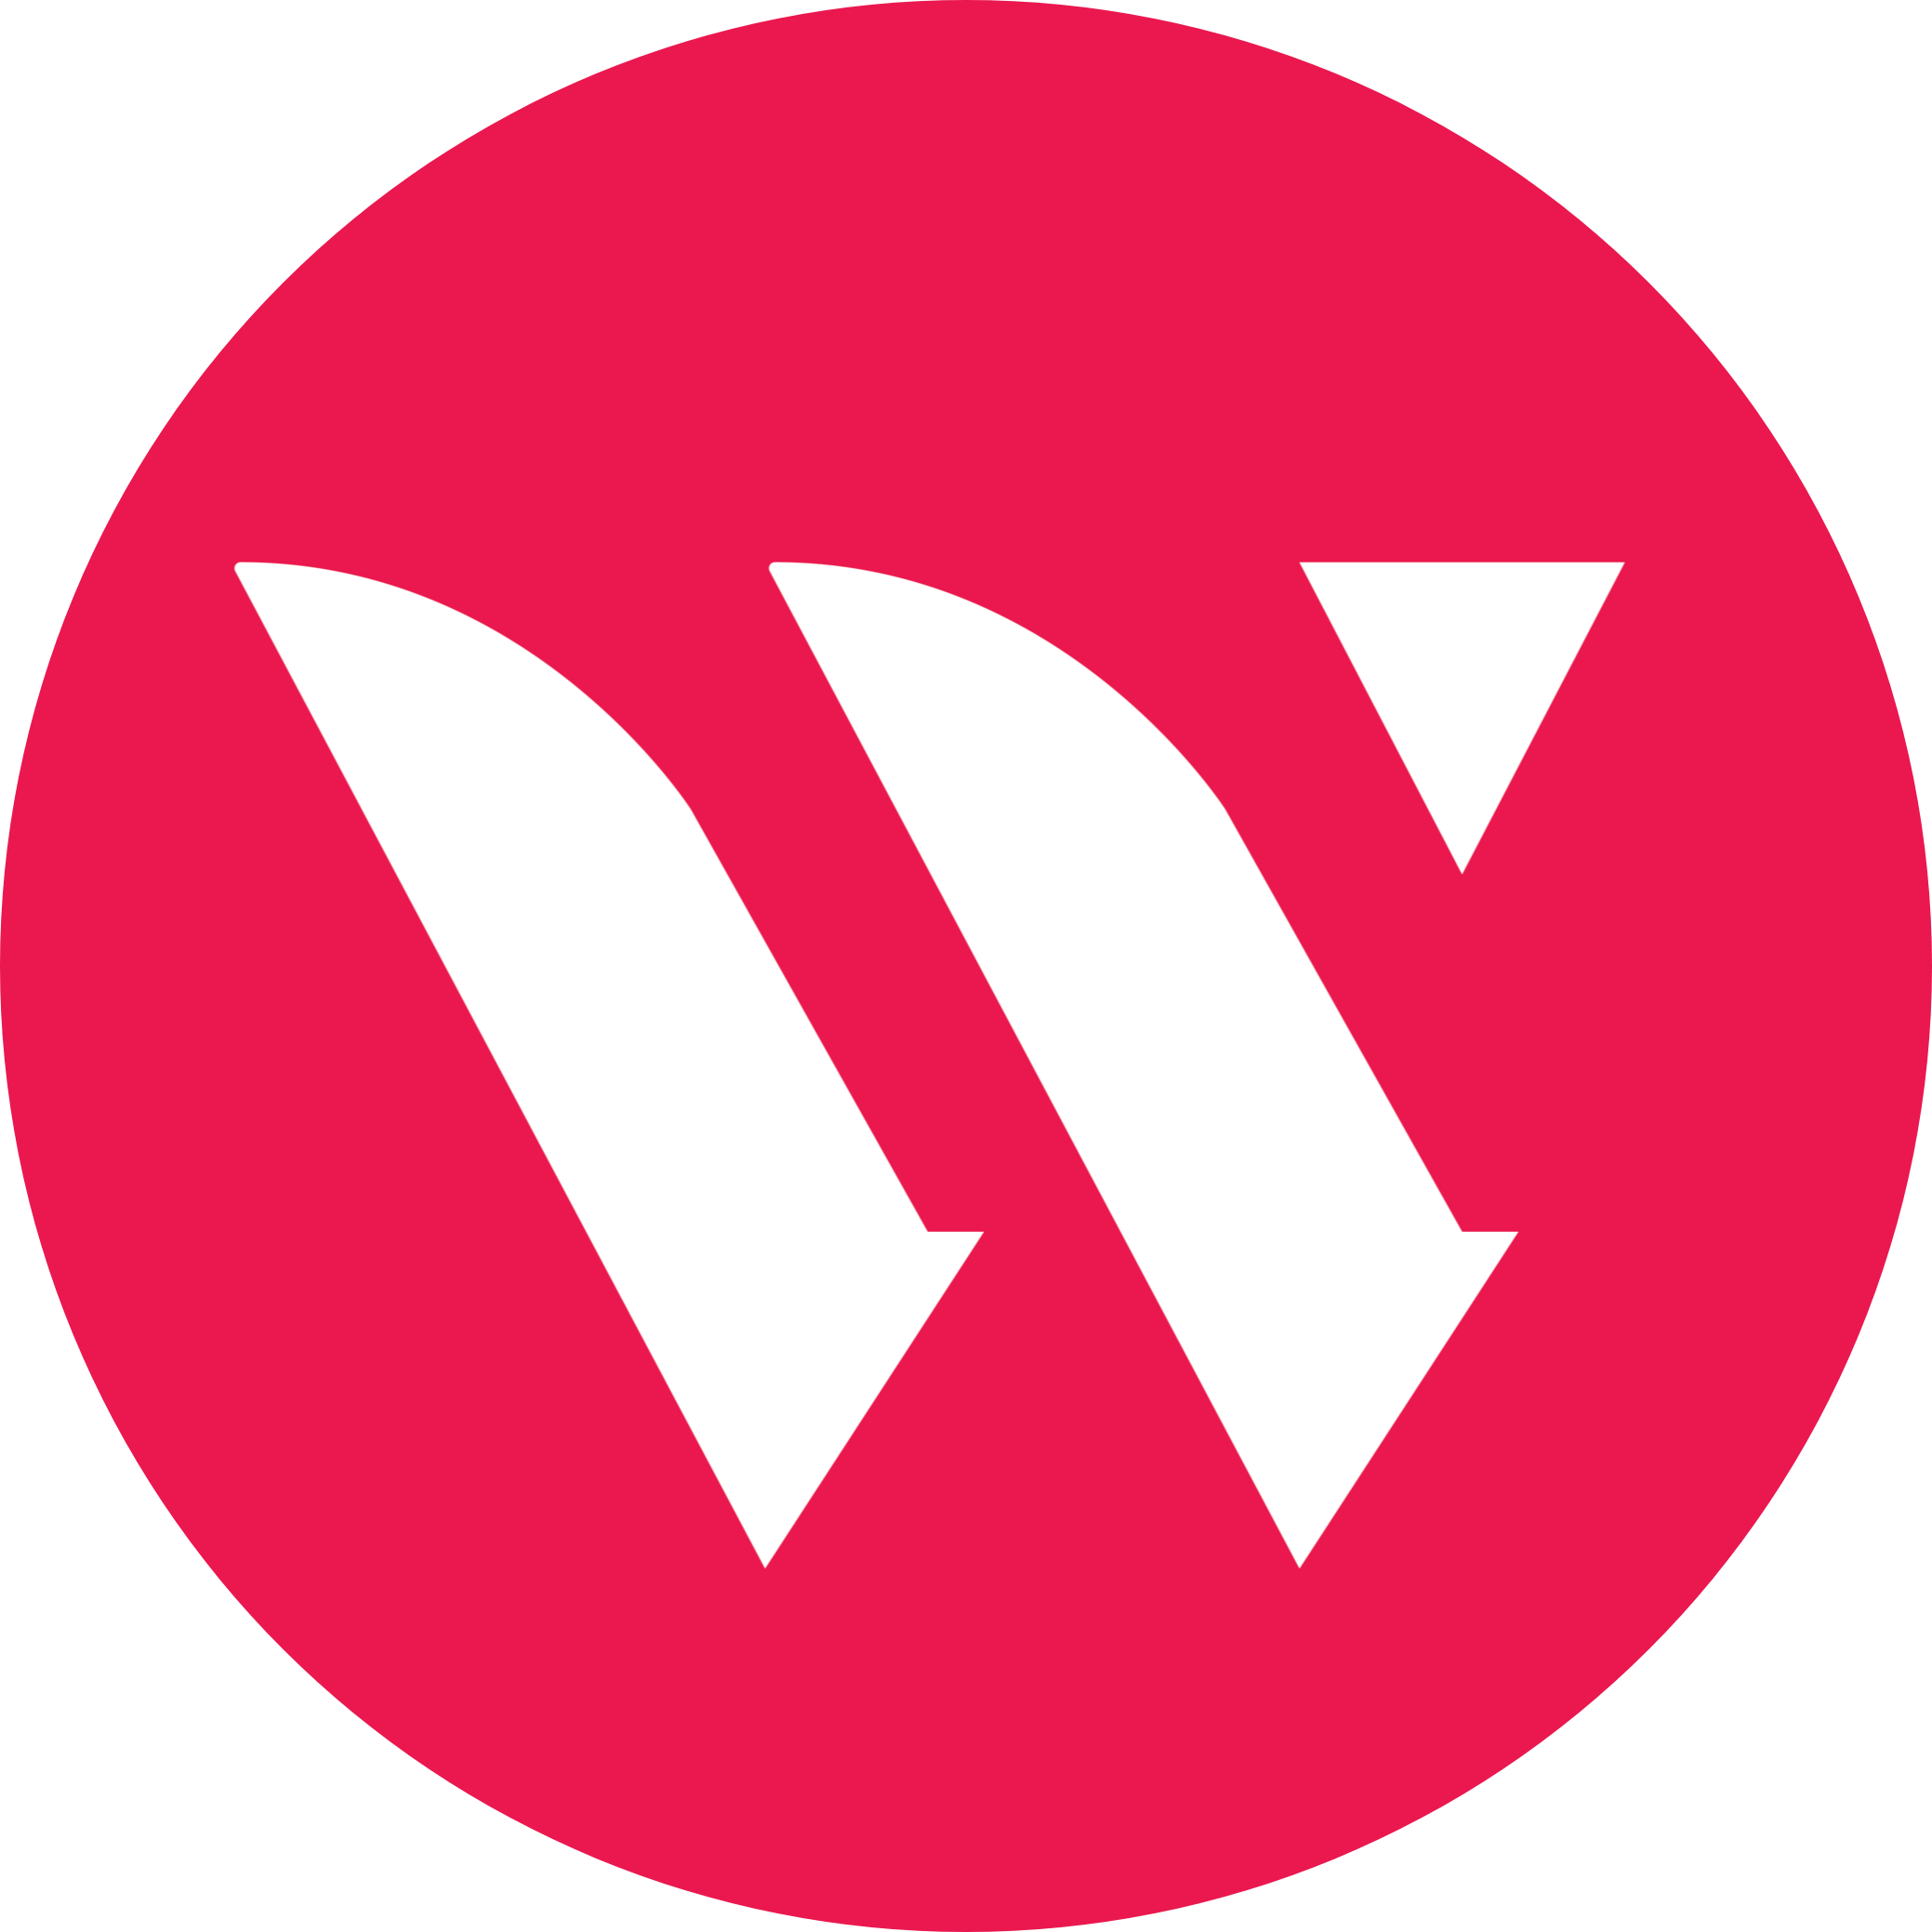 Webconix